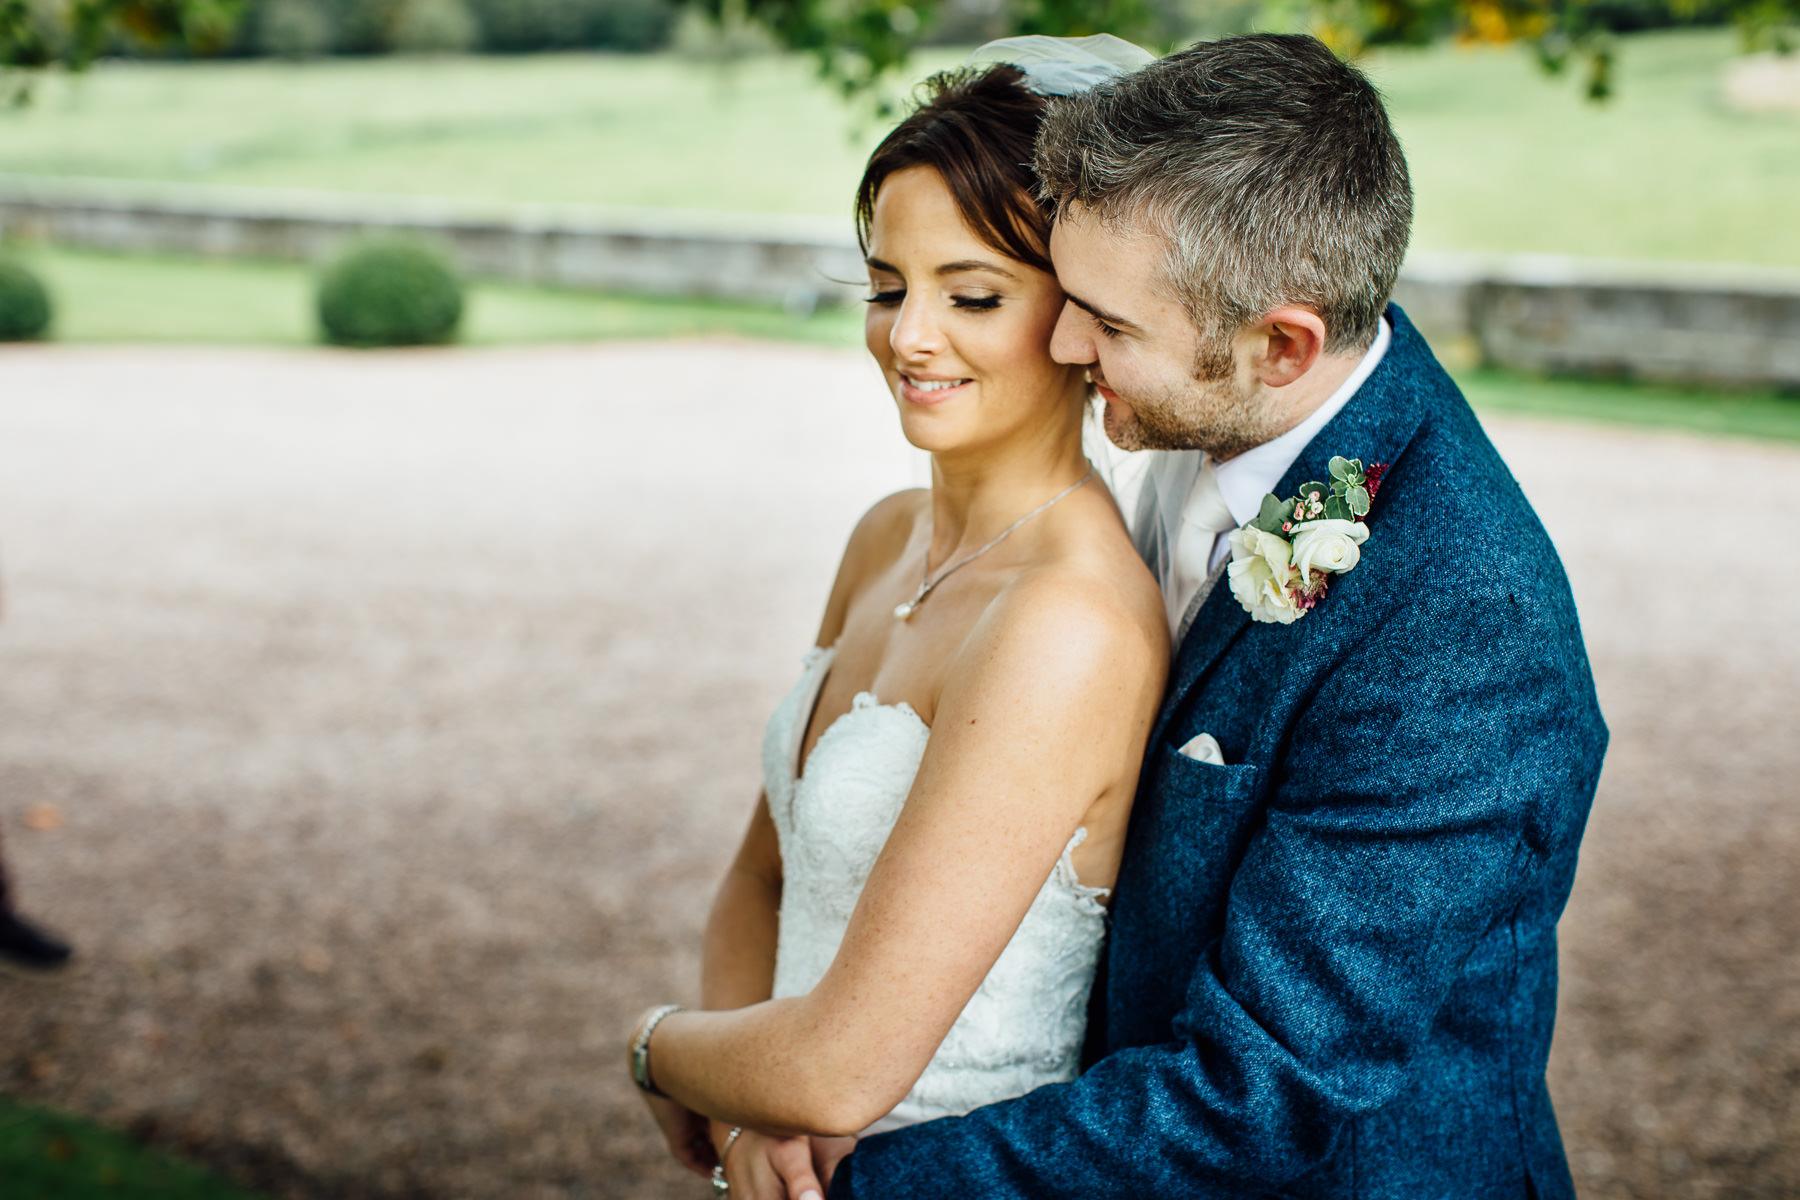 Wedding photography at Iscoyd Park